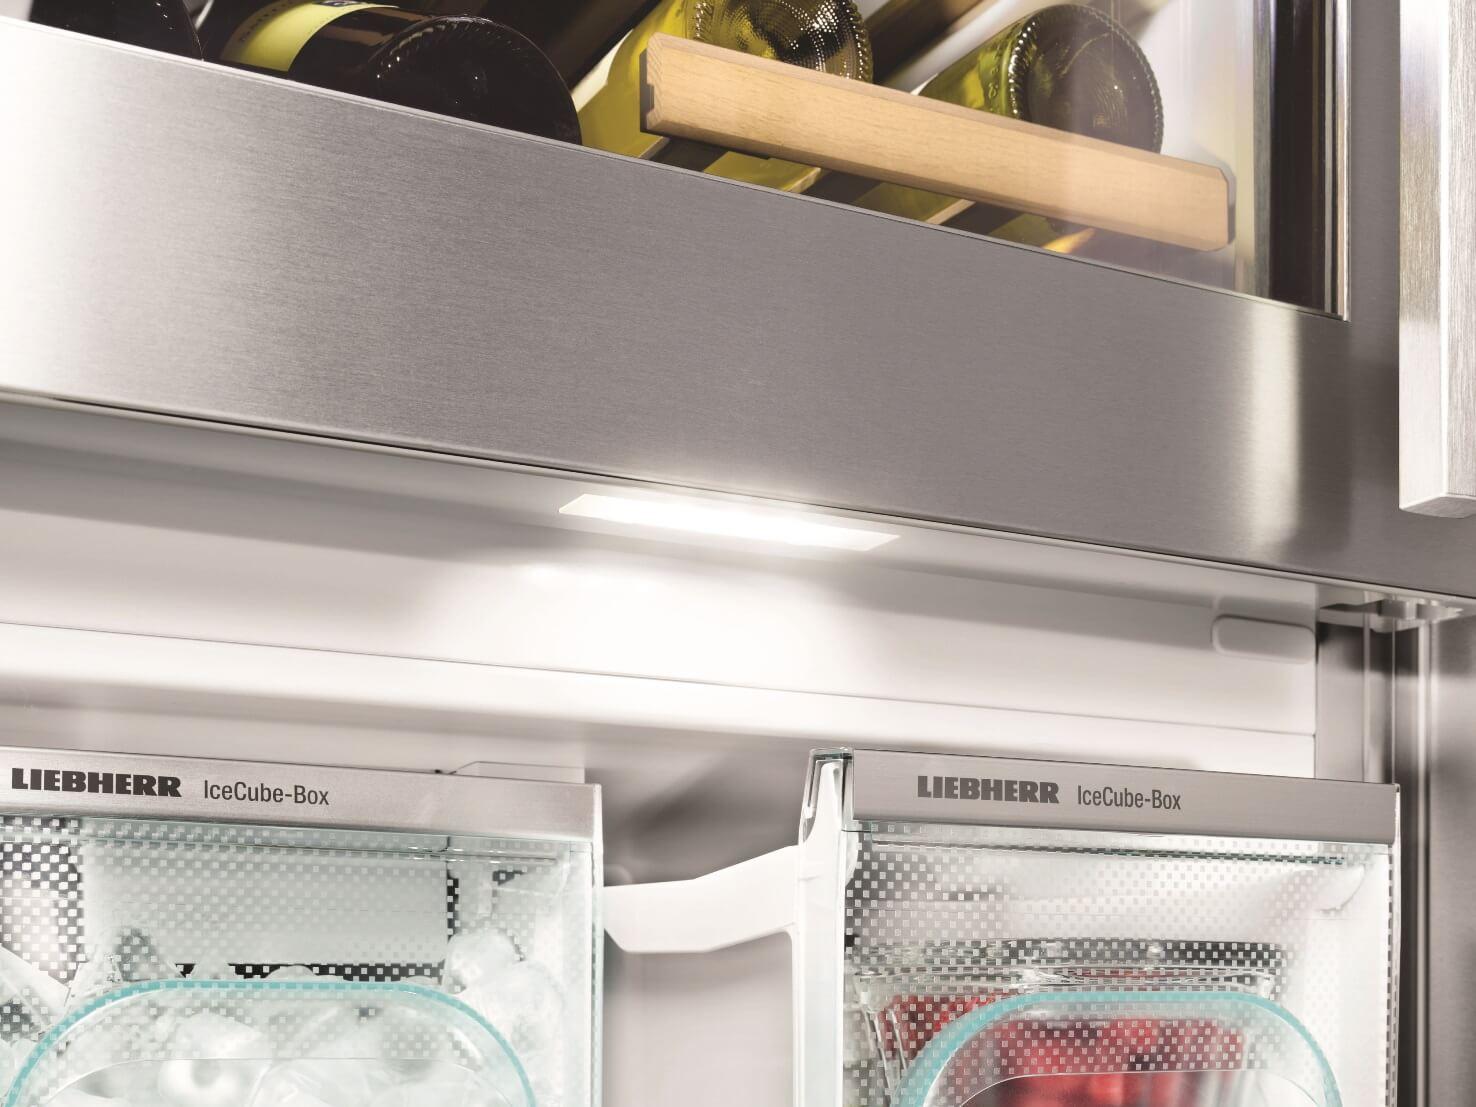 купить Side-by-Side холодильник Liebherr SBSes 8486 Украина фото 10